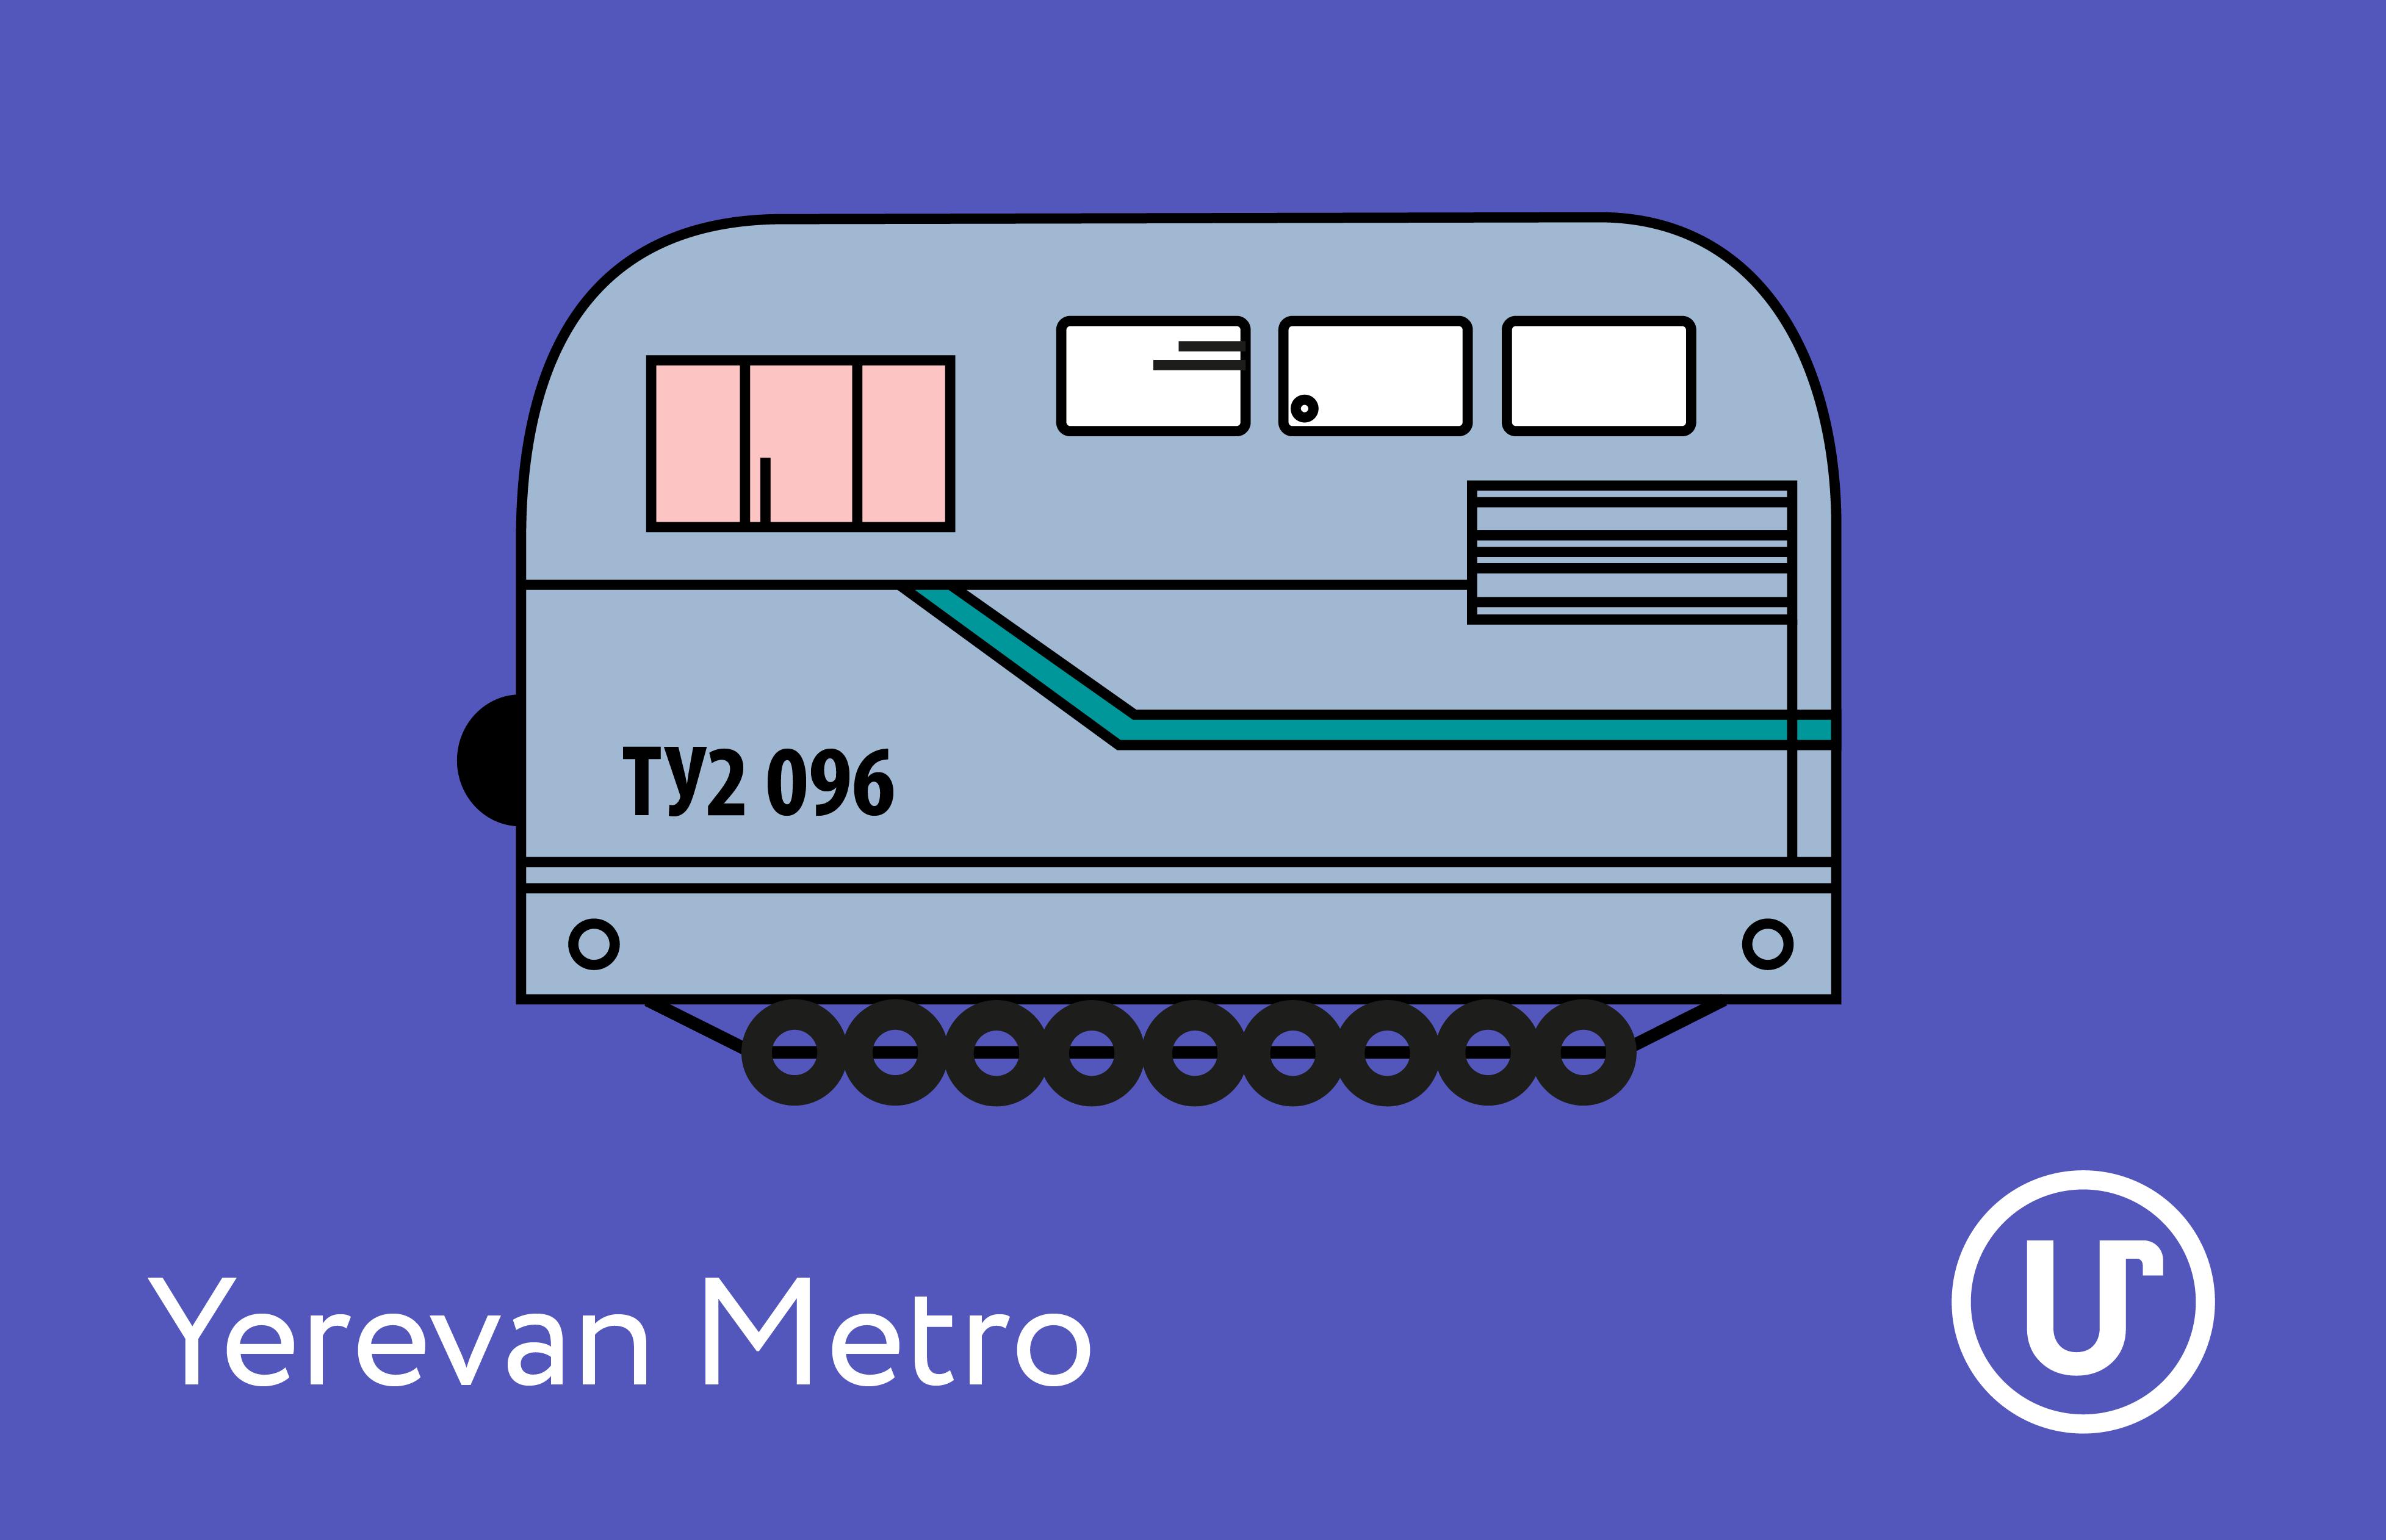 Erevan metro cards.ps Монтажная область 1 копия 2 - Illustrating Metro Passes with Natasha Dzola